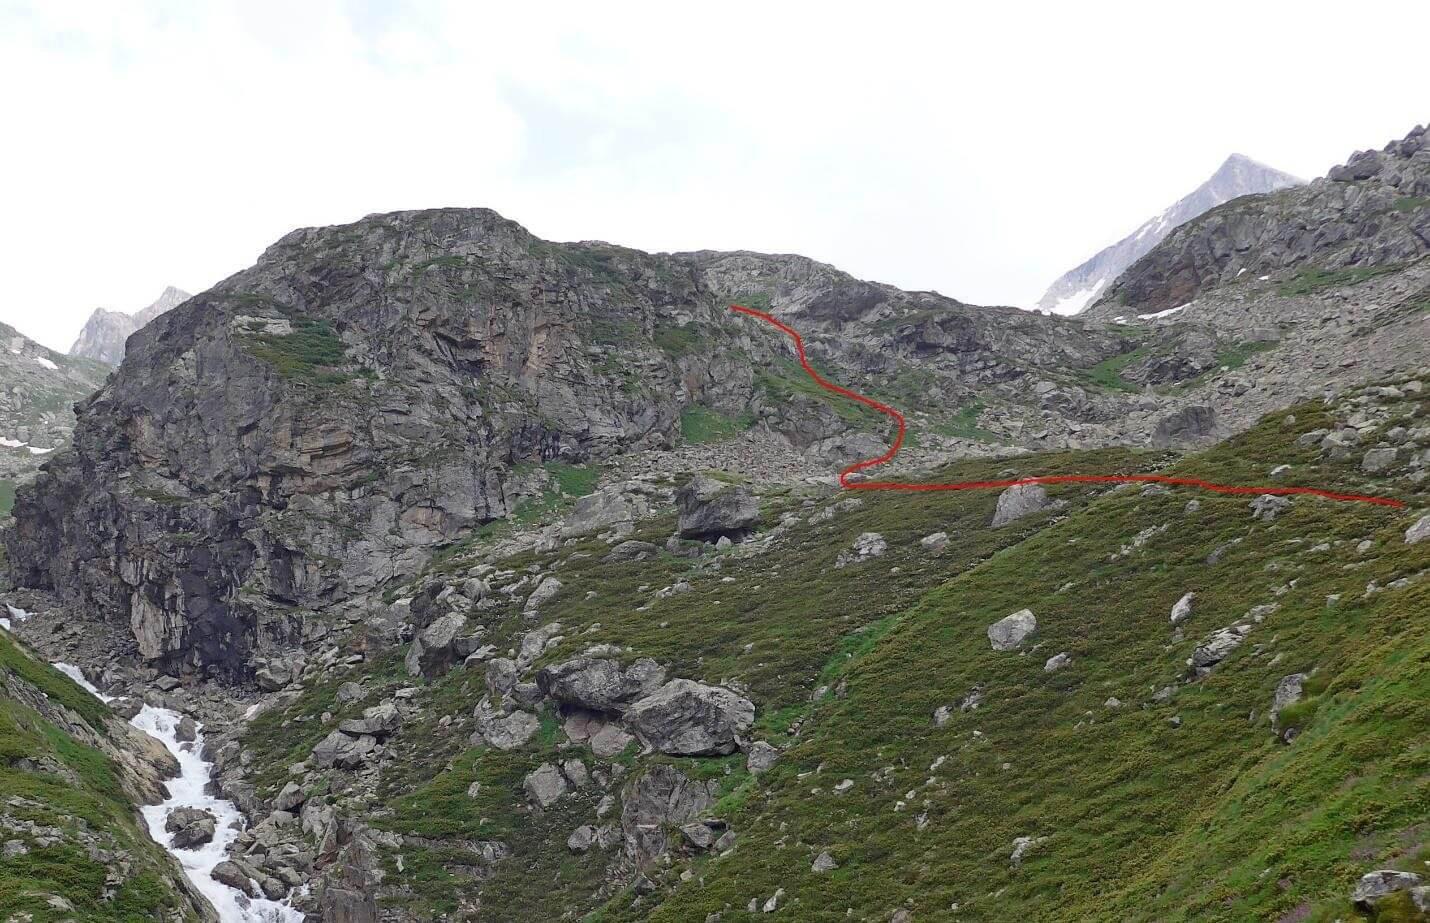 Отчет о горном маршруте 2 к.с. по Зап. Кавказу (Гвандра)